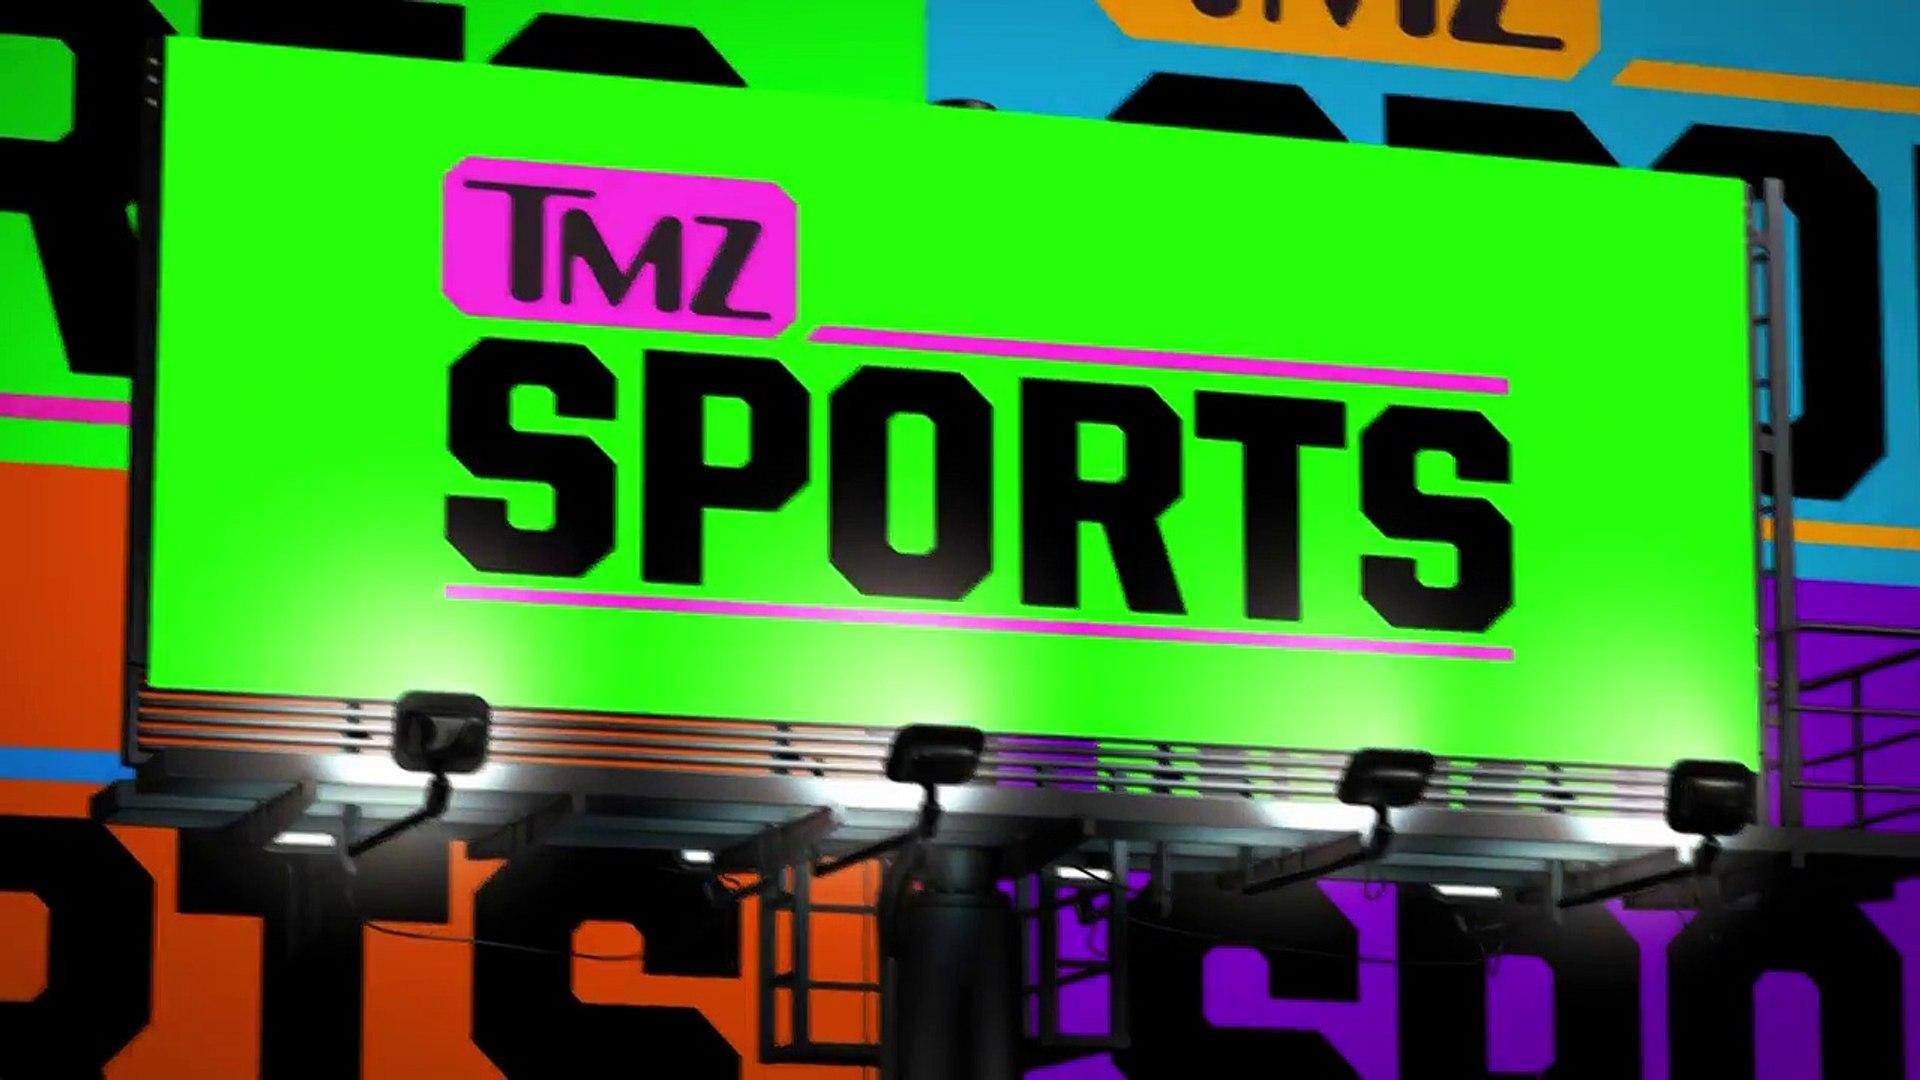 NFL's Brandon Marshall -- Wake Up Raiders ... Vegas Is Dangerous For NFL Players